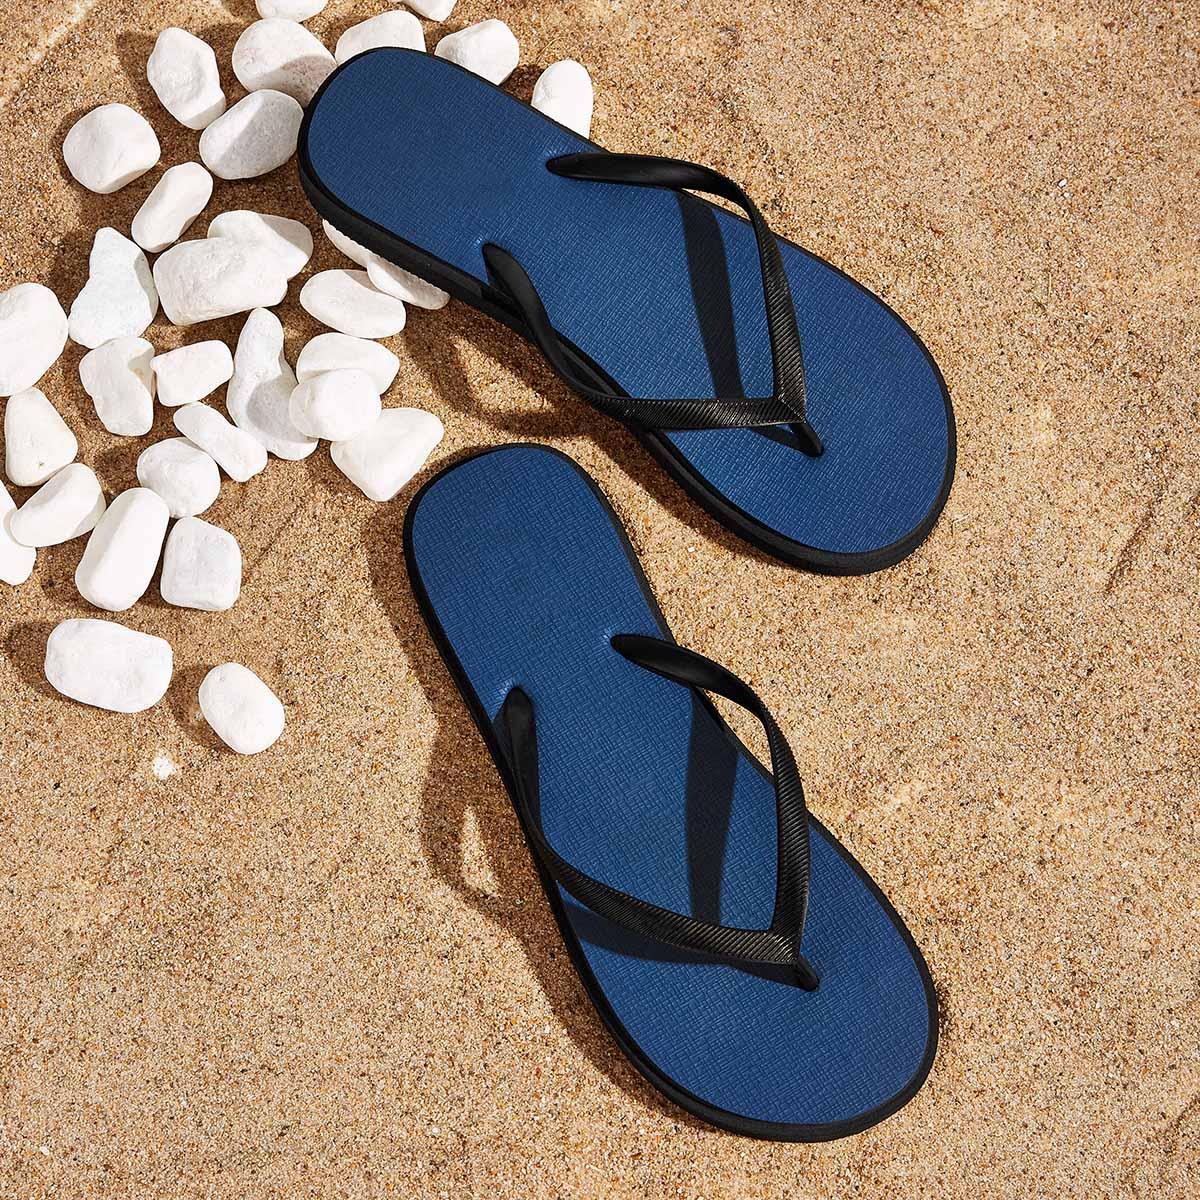 Minimalist Flip Flops